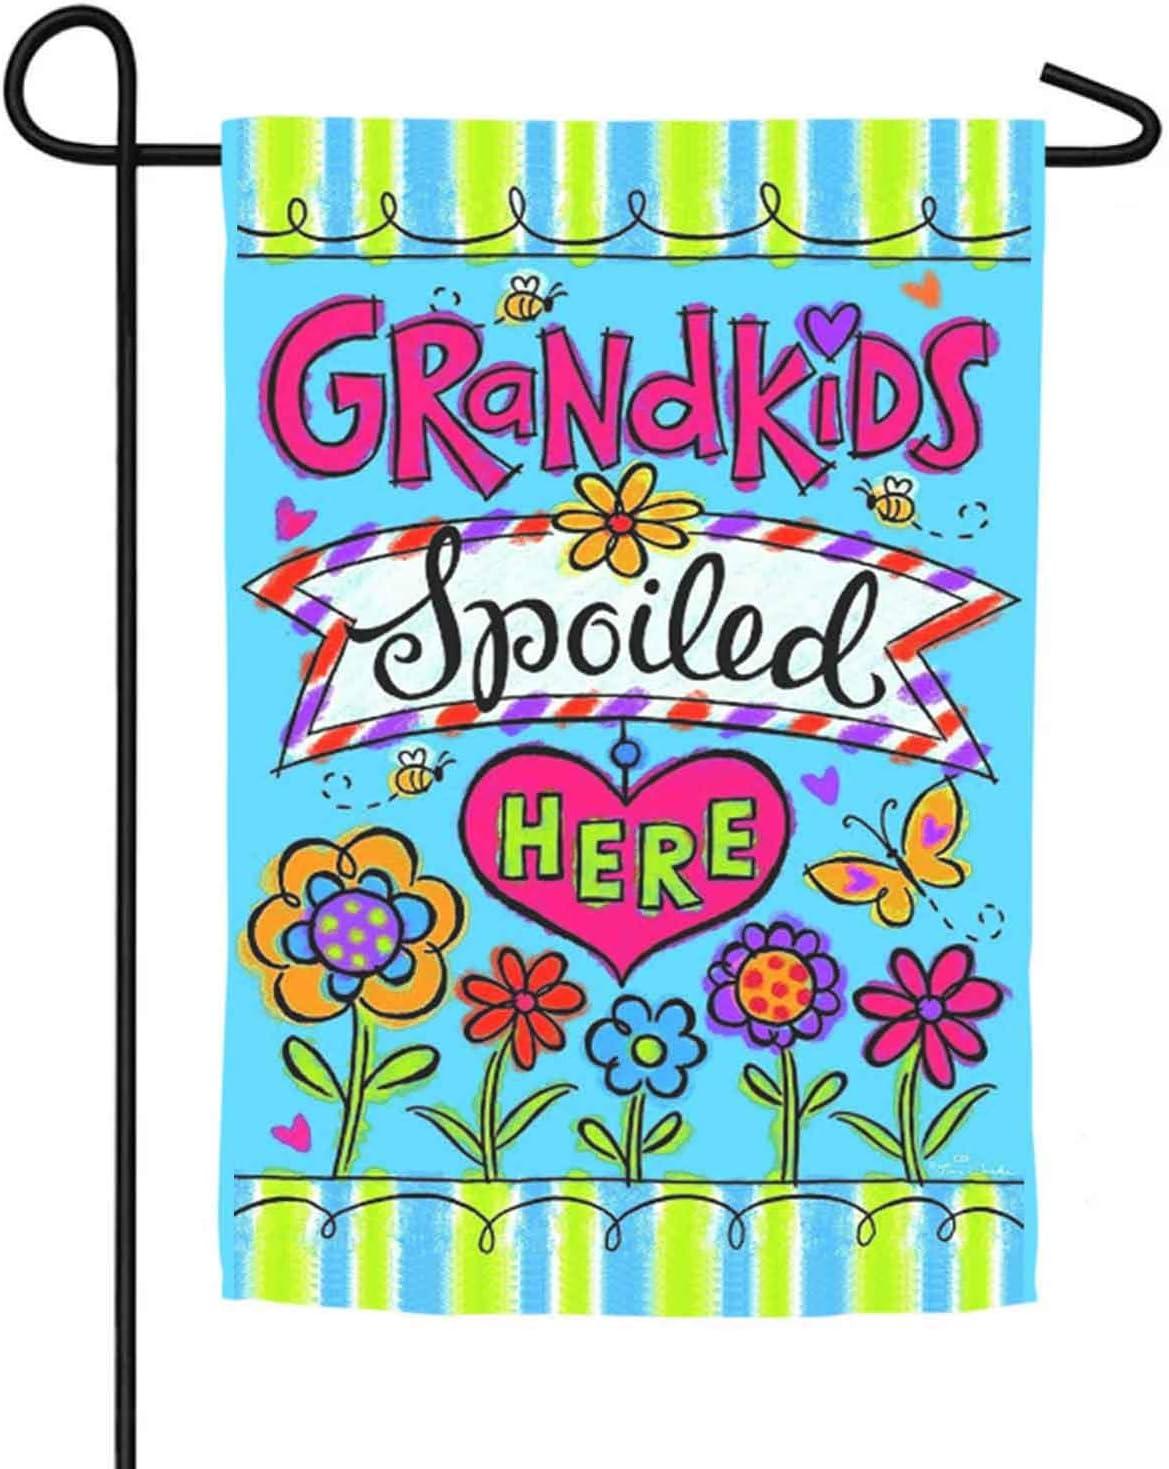 CZQHFLAU Grandkids Spoiled Here Farmhouse Yard Outdoor Decoration Burlap Garden Flag 12.5 x 18 Inch Double Sided